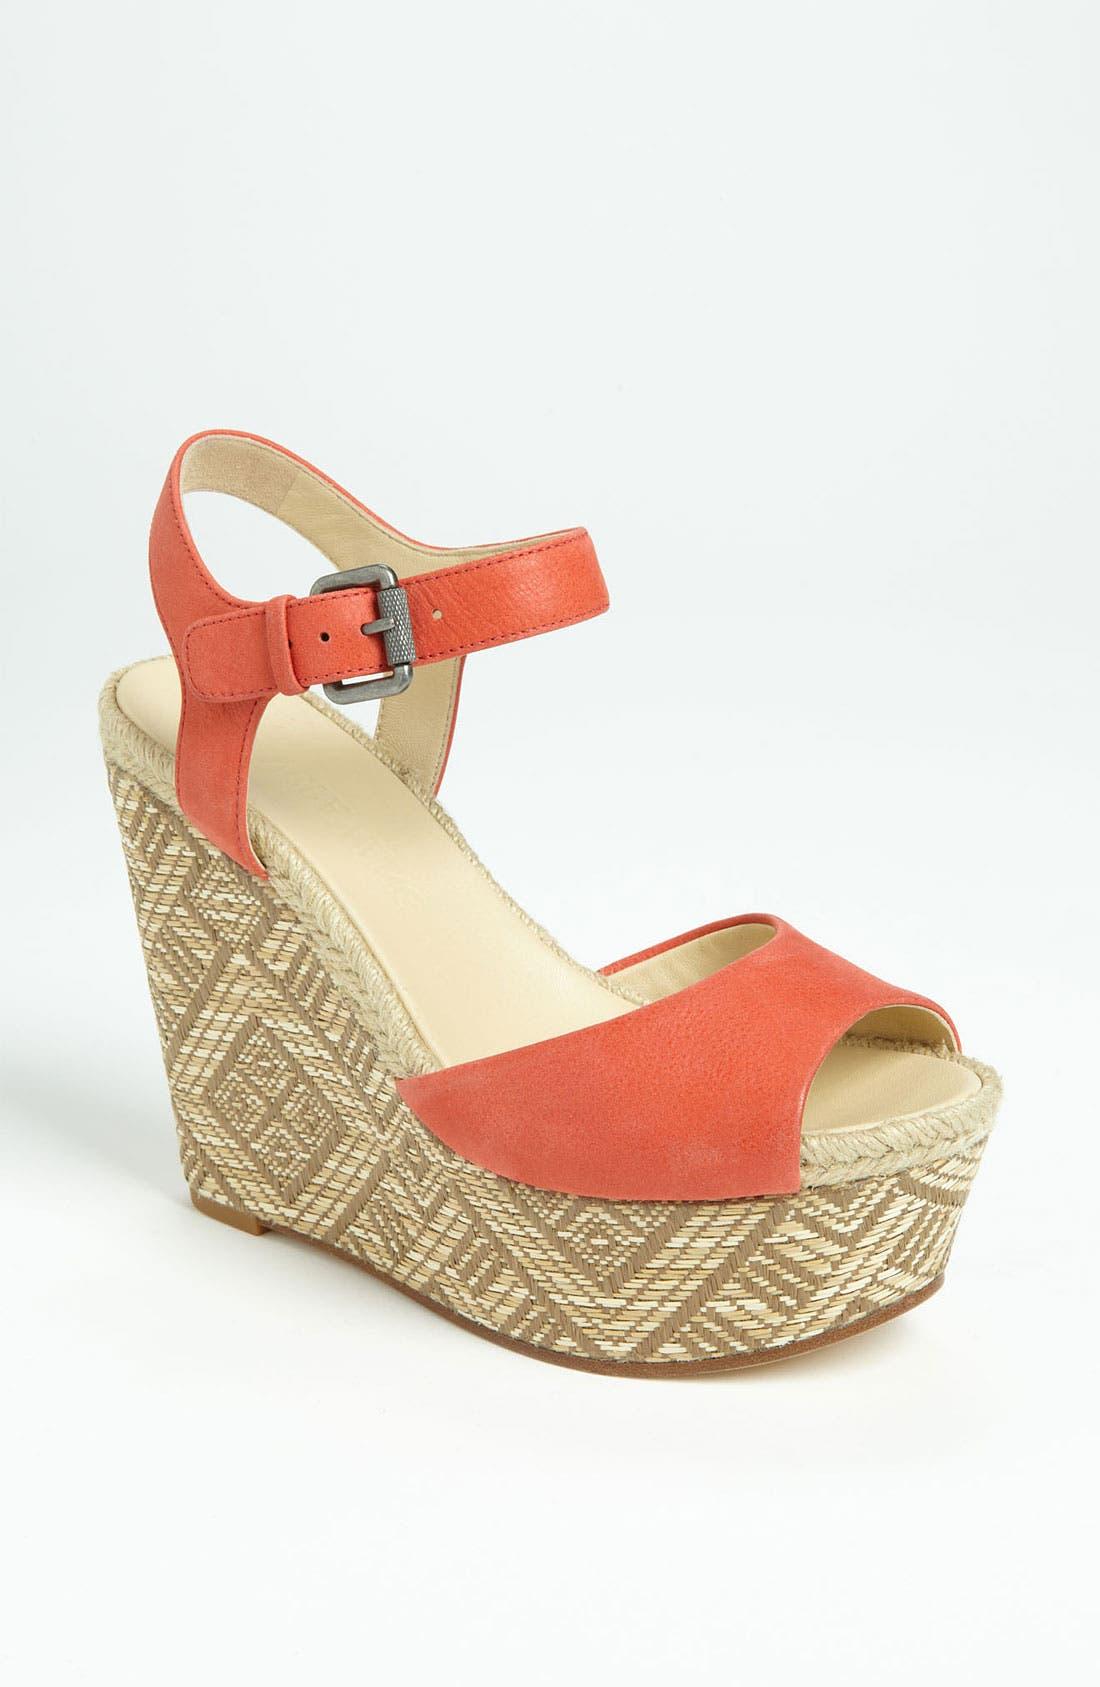 Main Image - Vera Wang Footwear Wedge Sandal